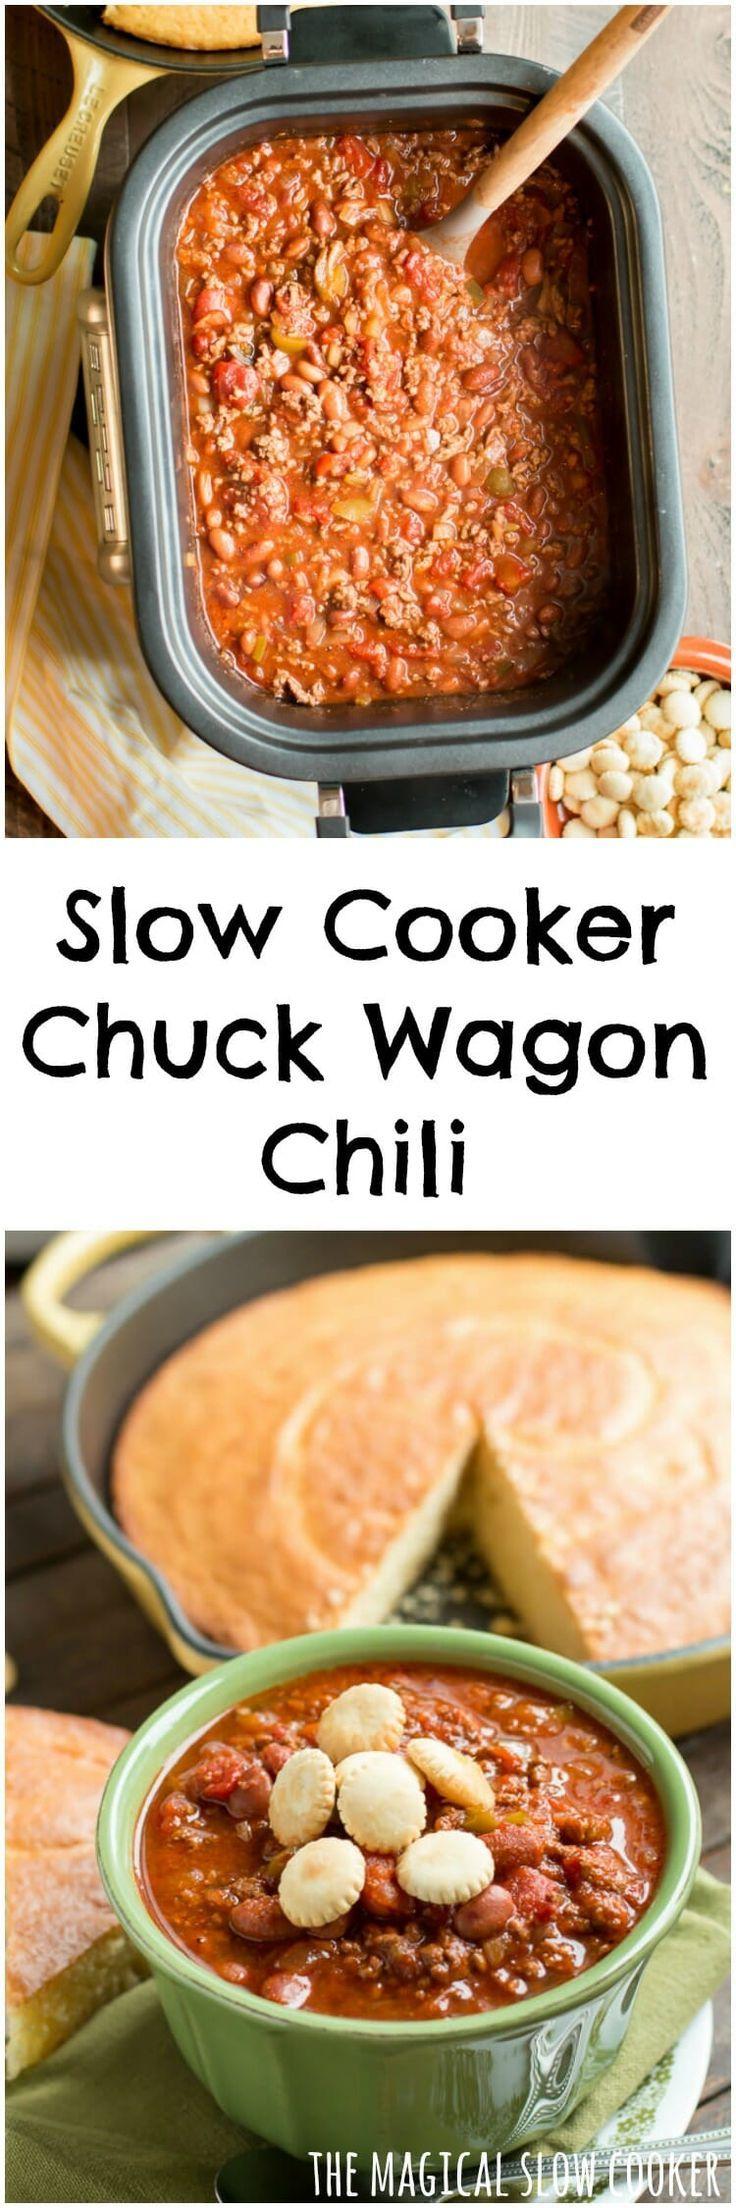 Slow Cooker Chuck Wagon Chili #chili #crockpot #slowcooker